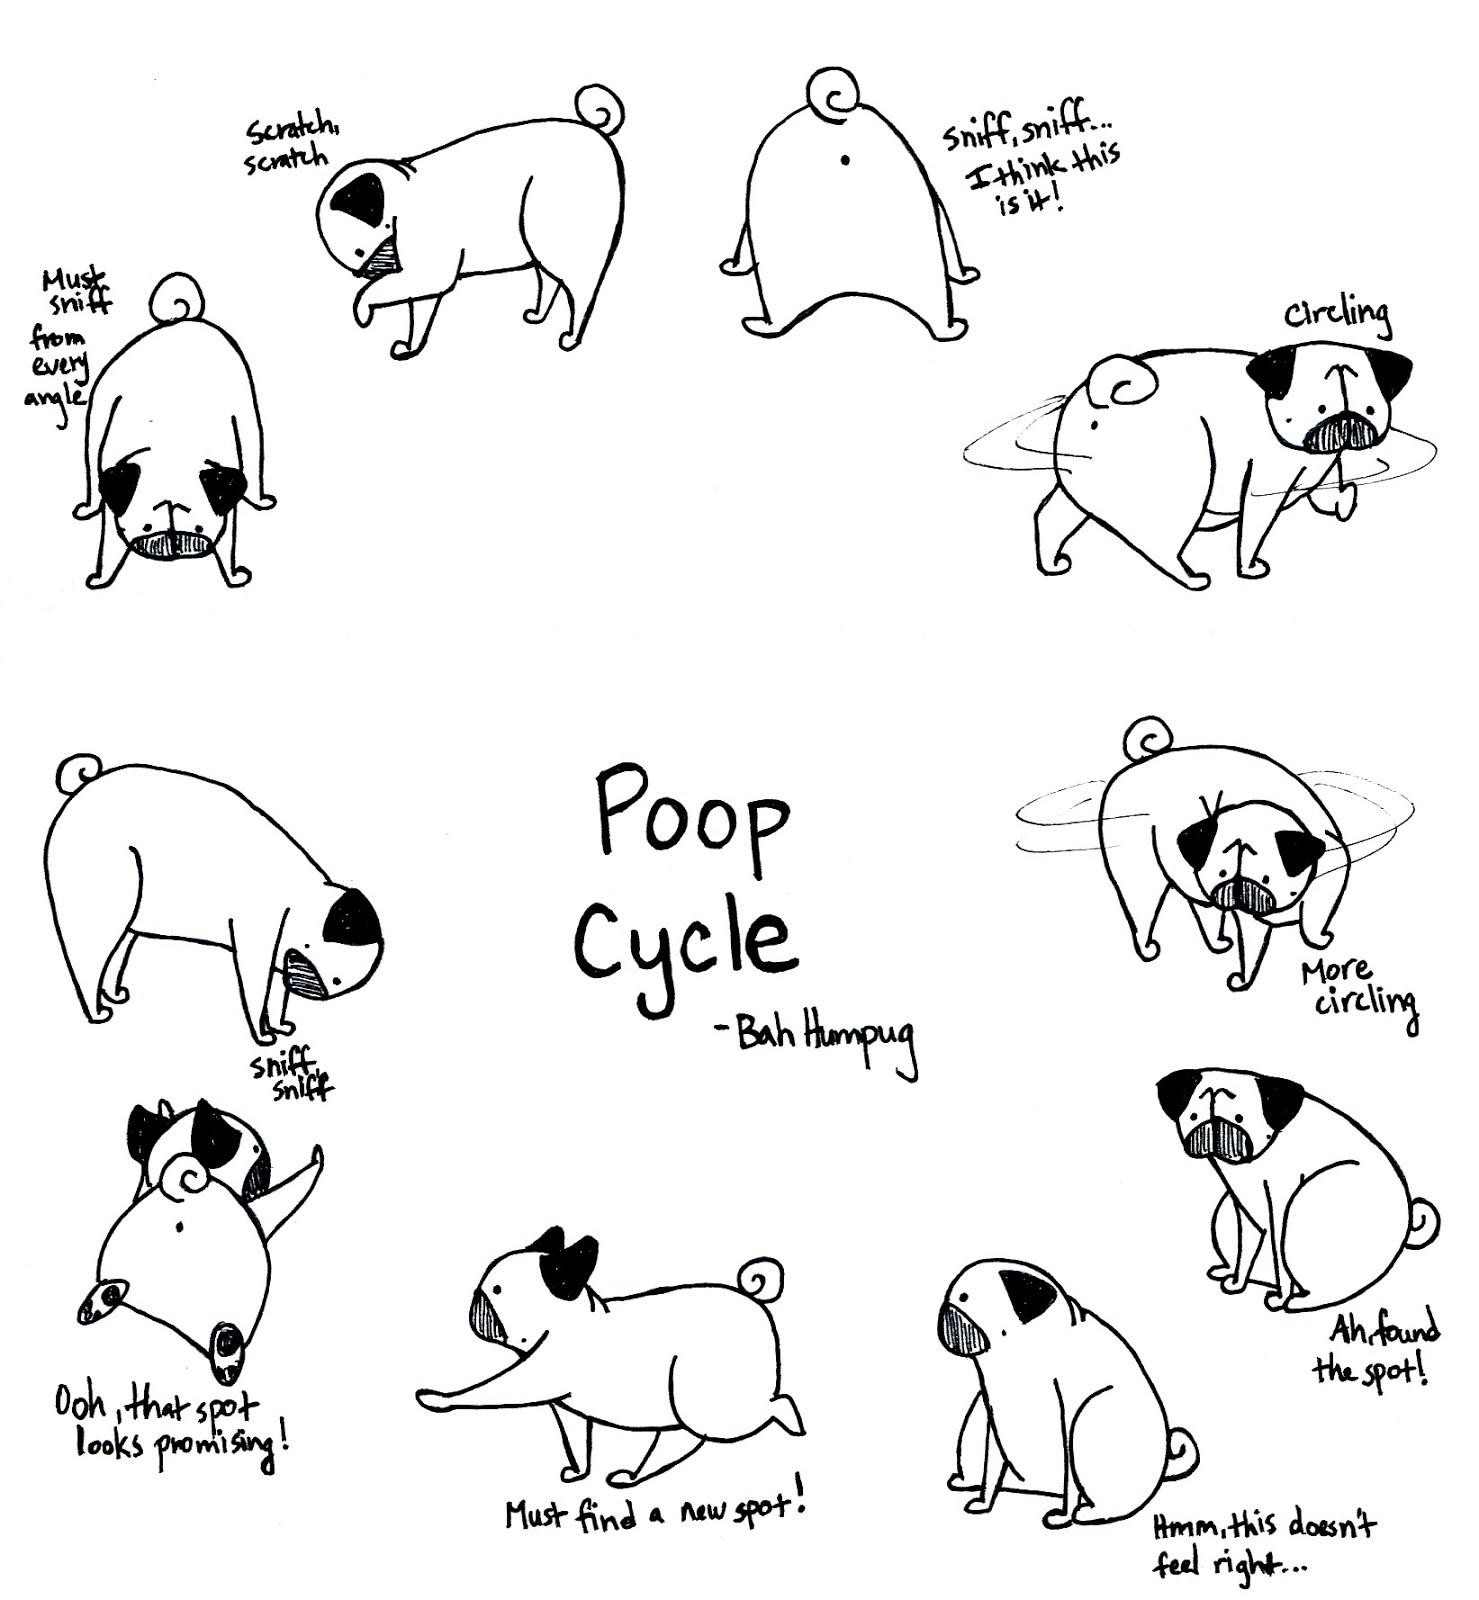 Drawn pug poo Humpug: Cycle Pug Cycle Poop